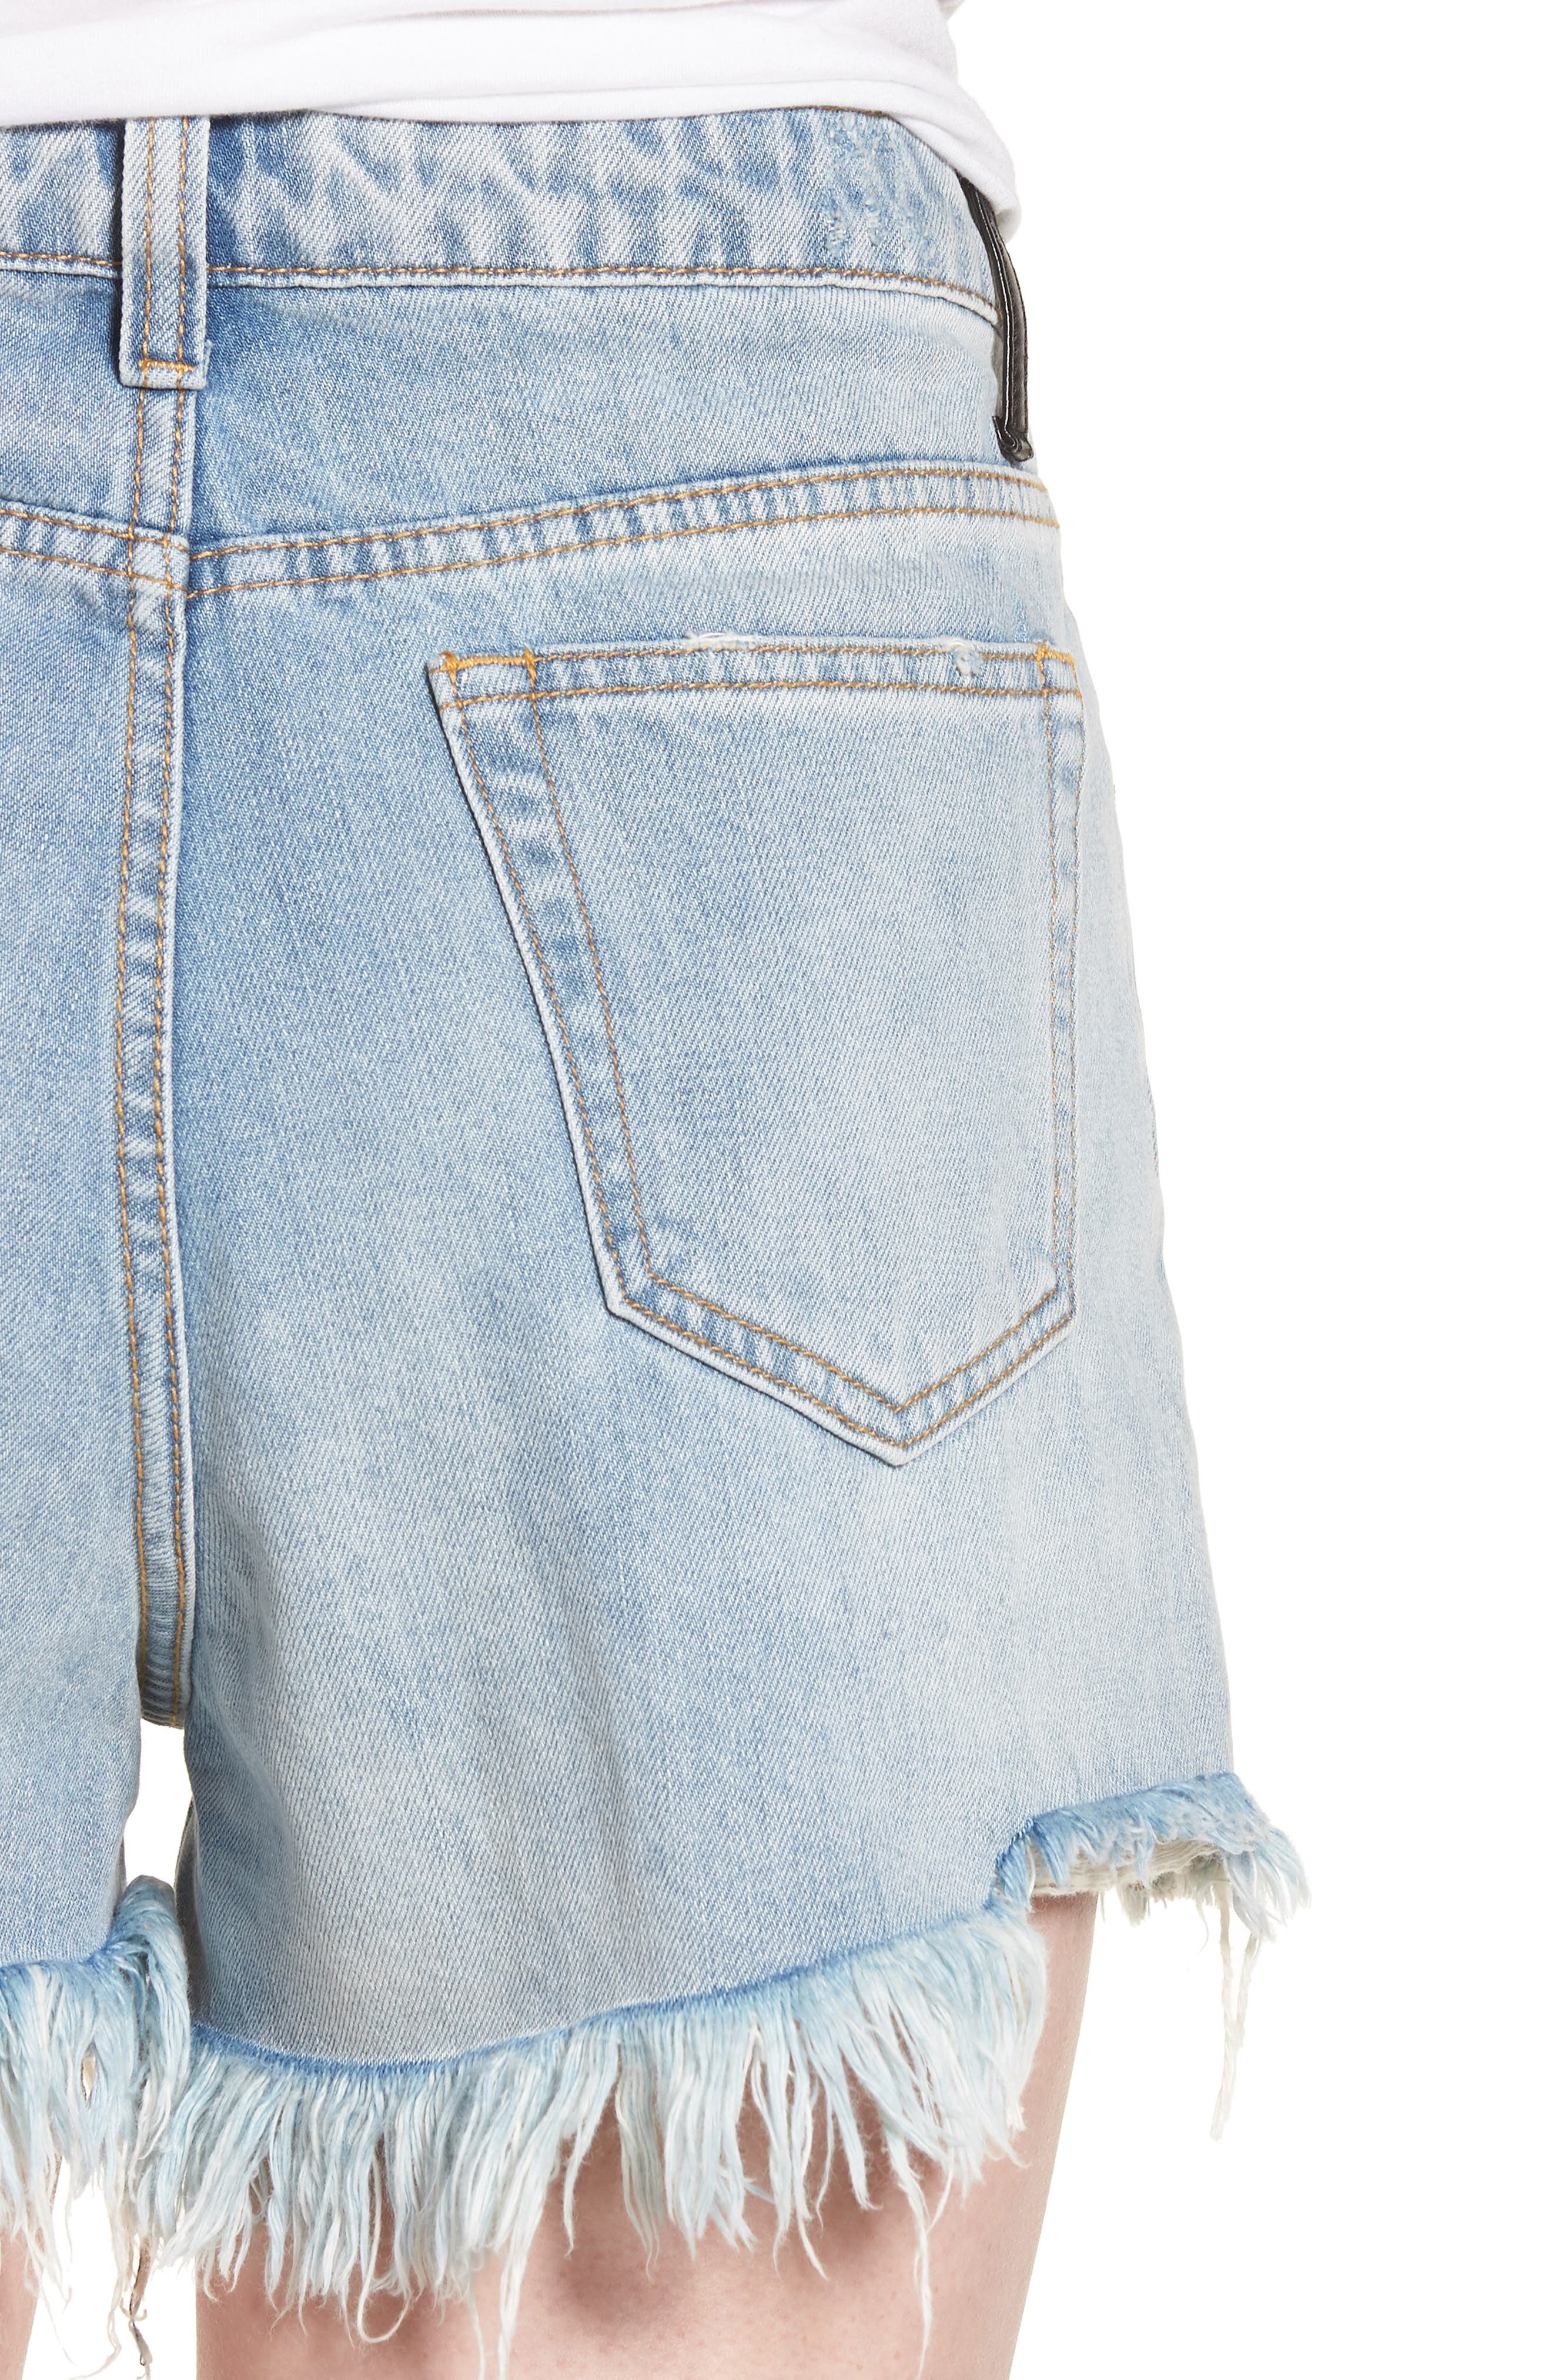 Arien High Waist Cutoff Denim Shorts,                             Alternate thumbnail 4, color,                             Washed Blue